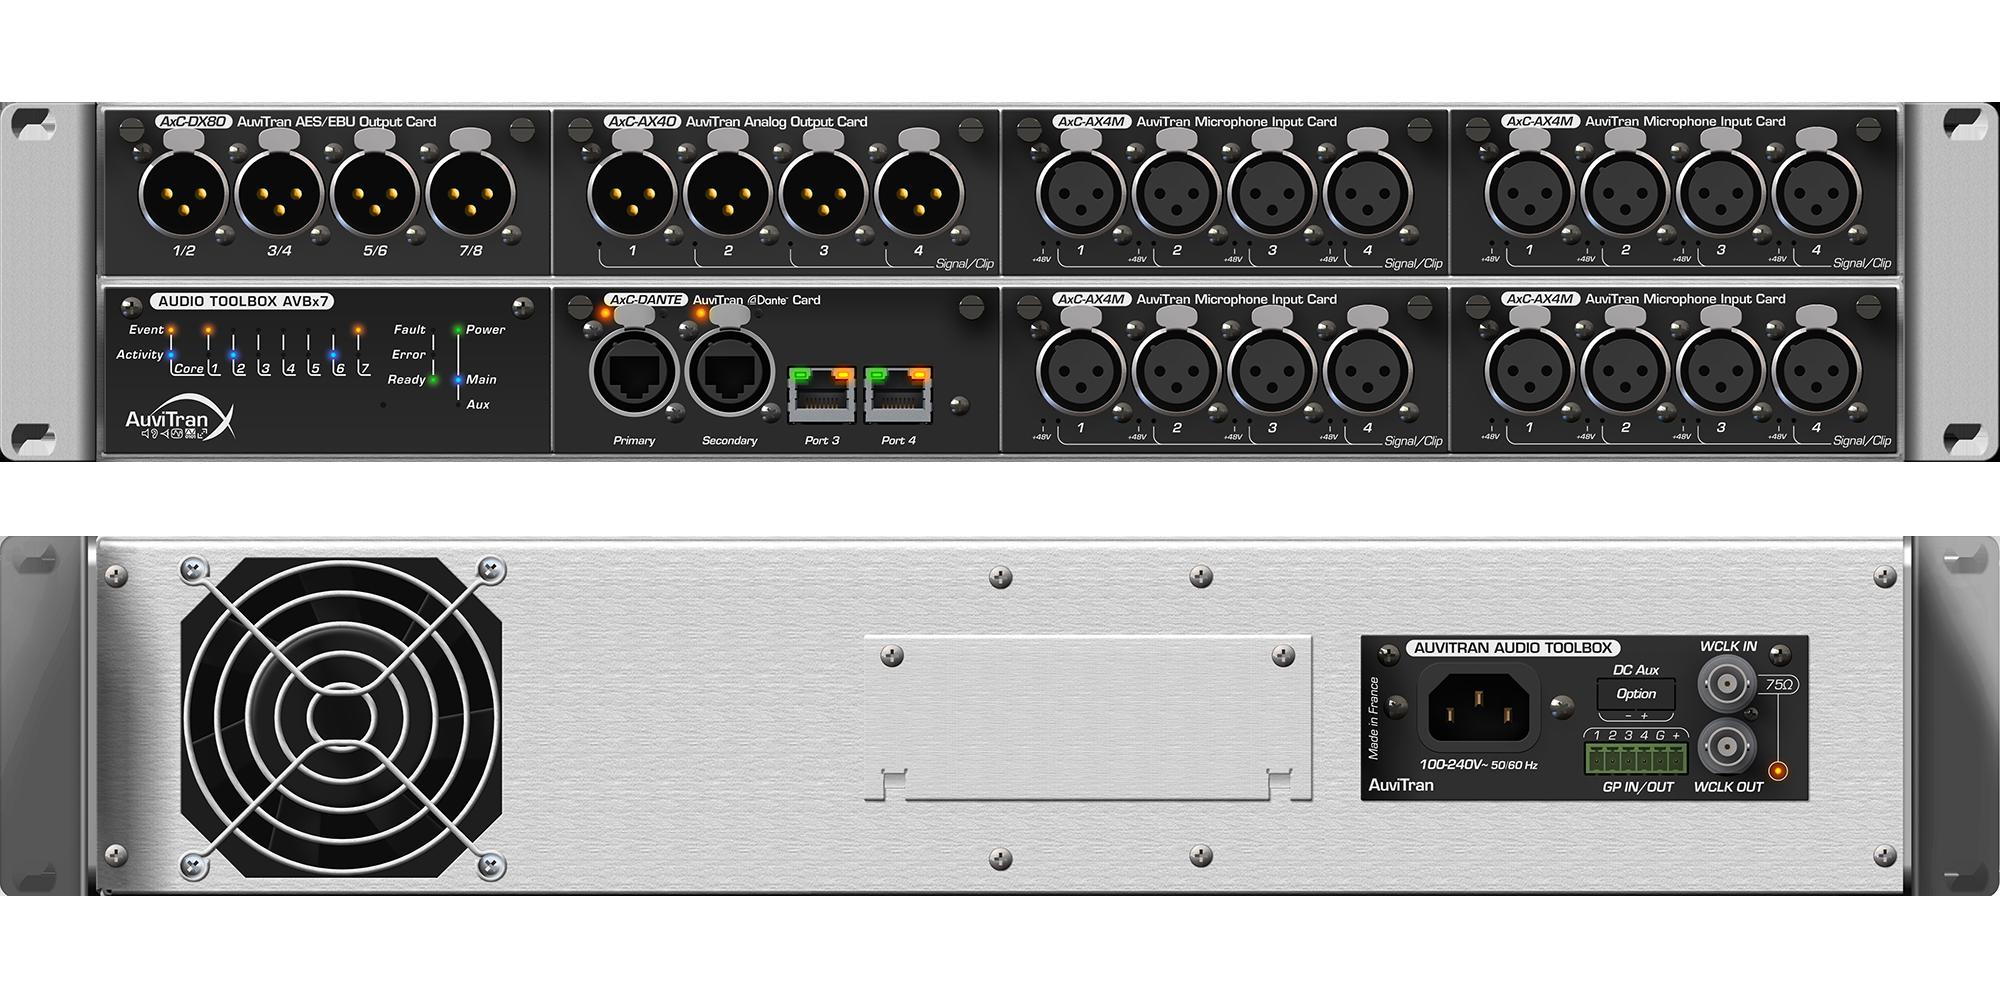 Audio ToolBox StageBox Model AVBx7